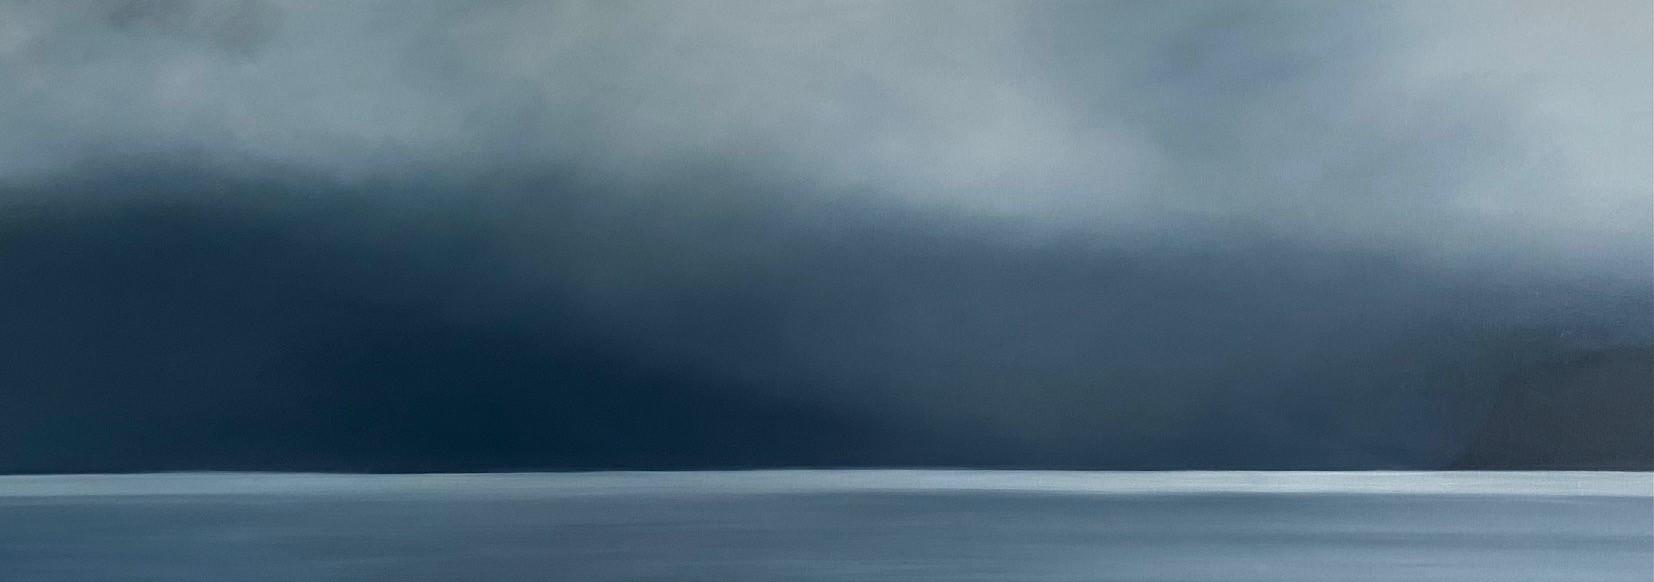 Kim Wilson - Hawkesbury Mist